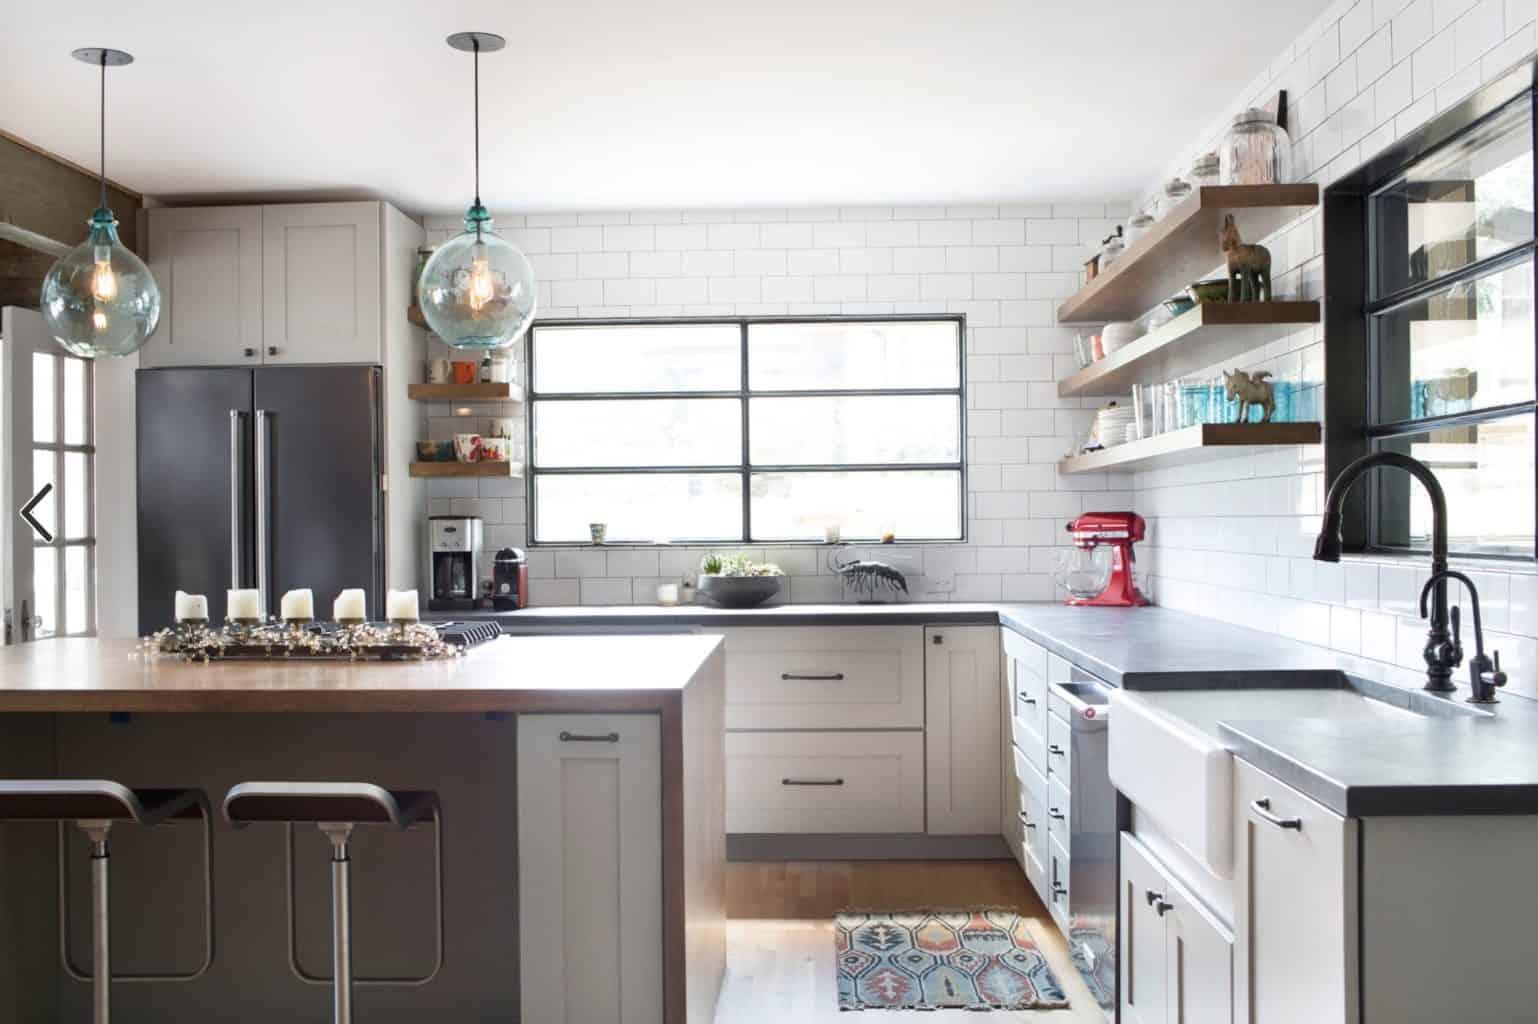 WinstonResidence-Kitchen